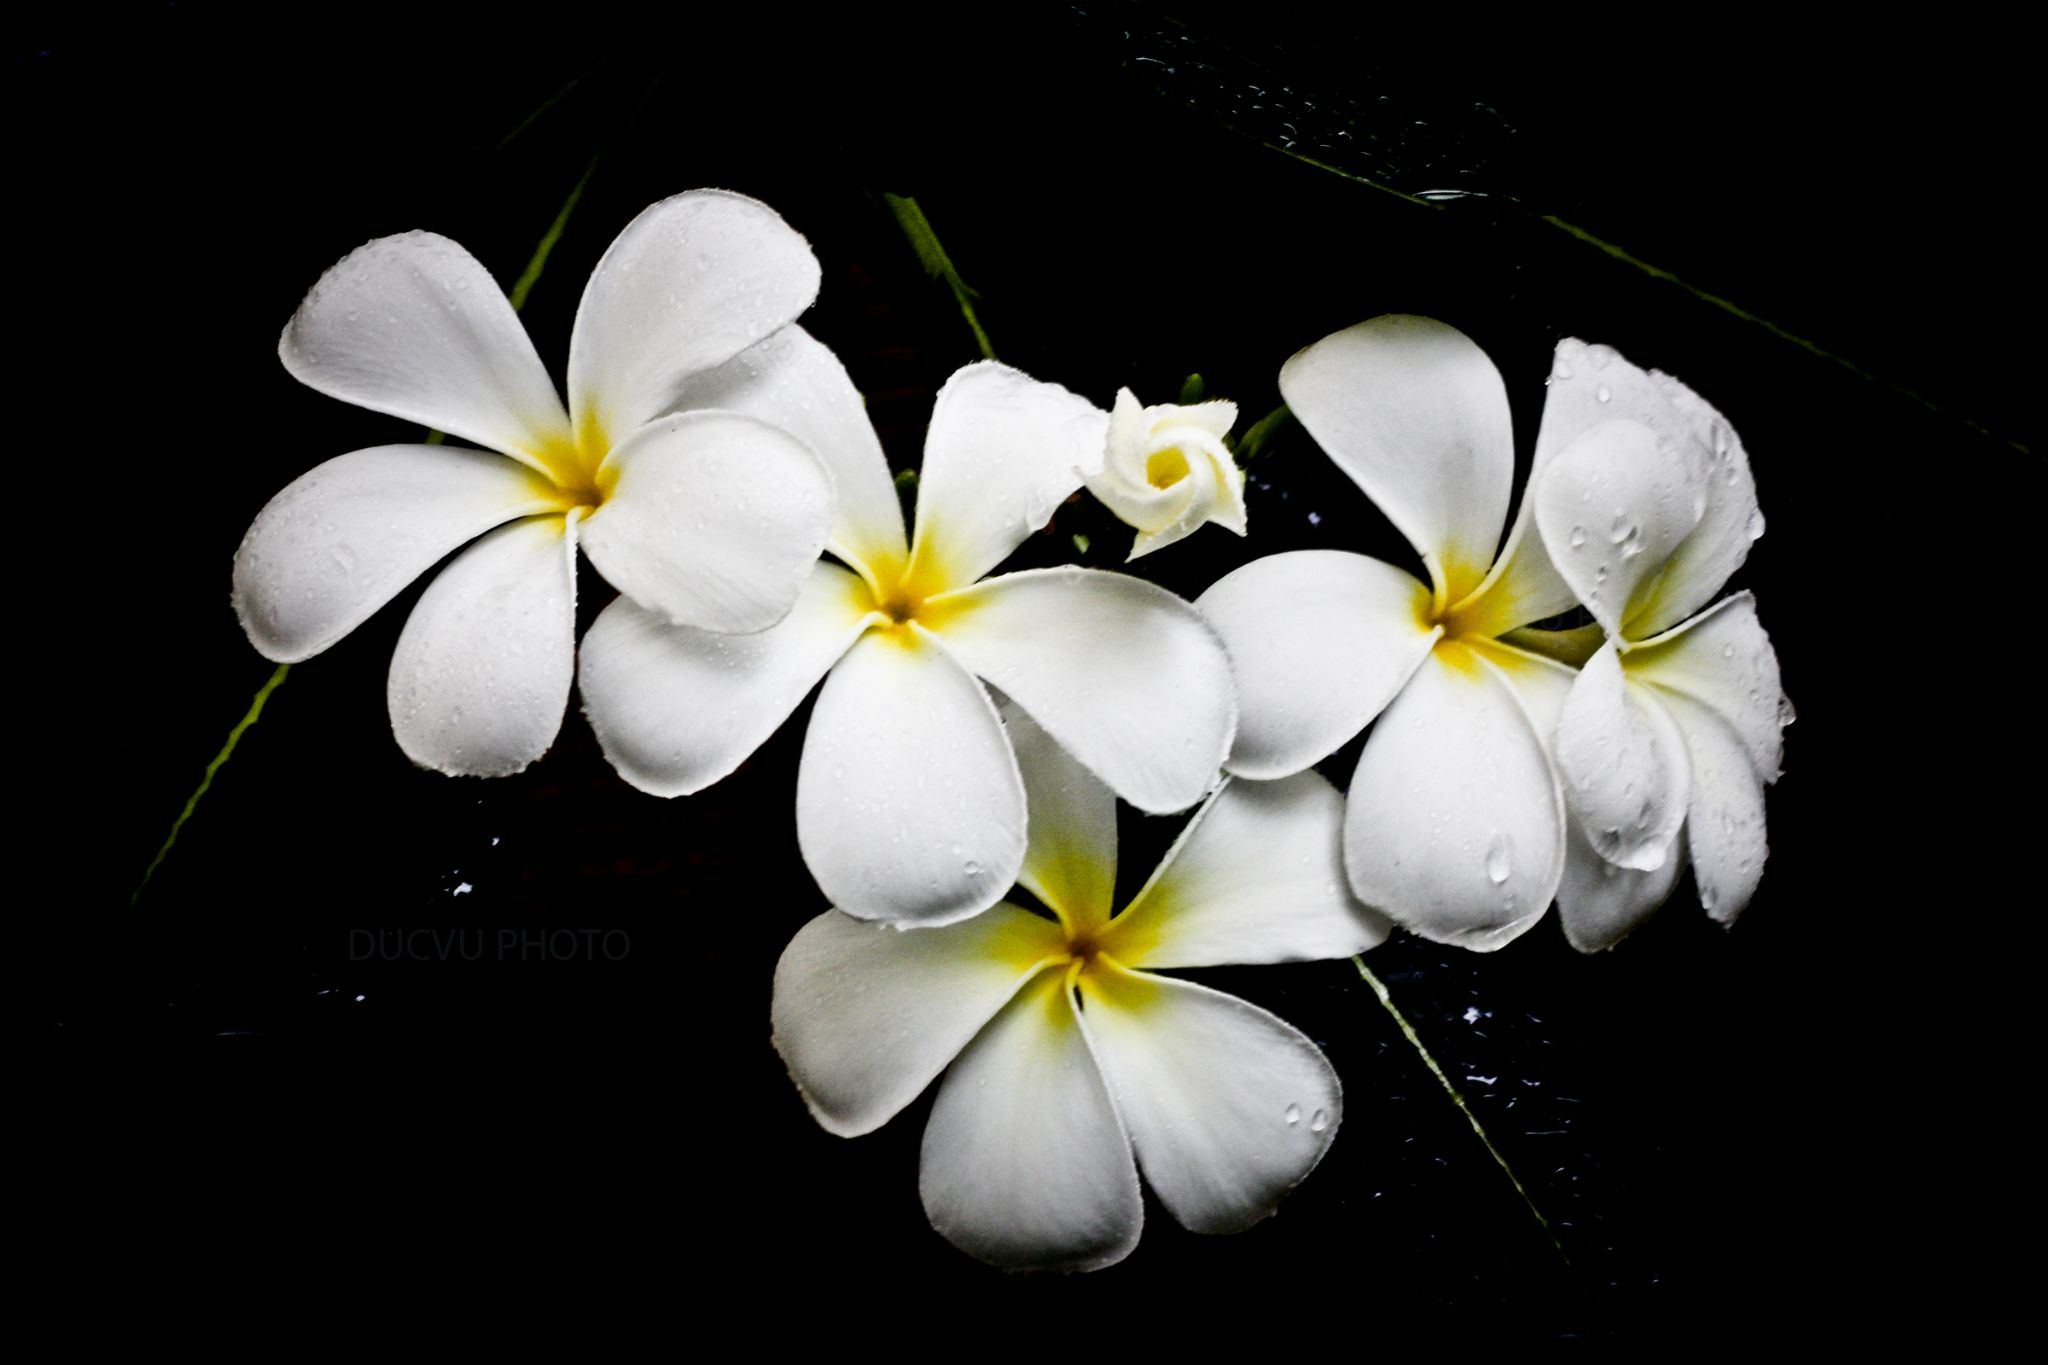 Flower by ducvu1310